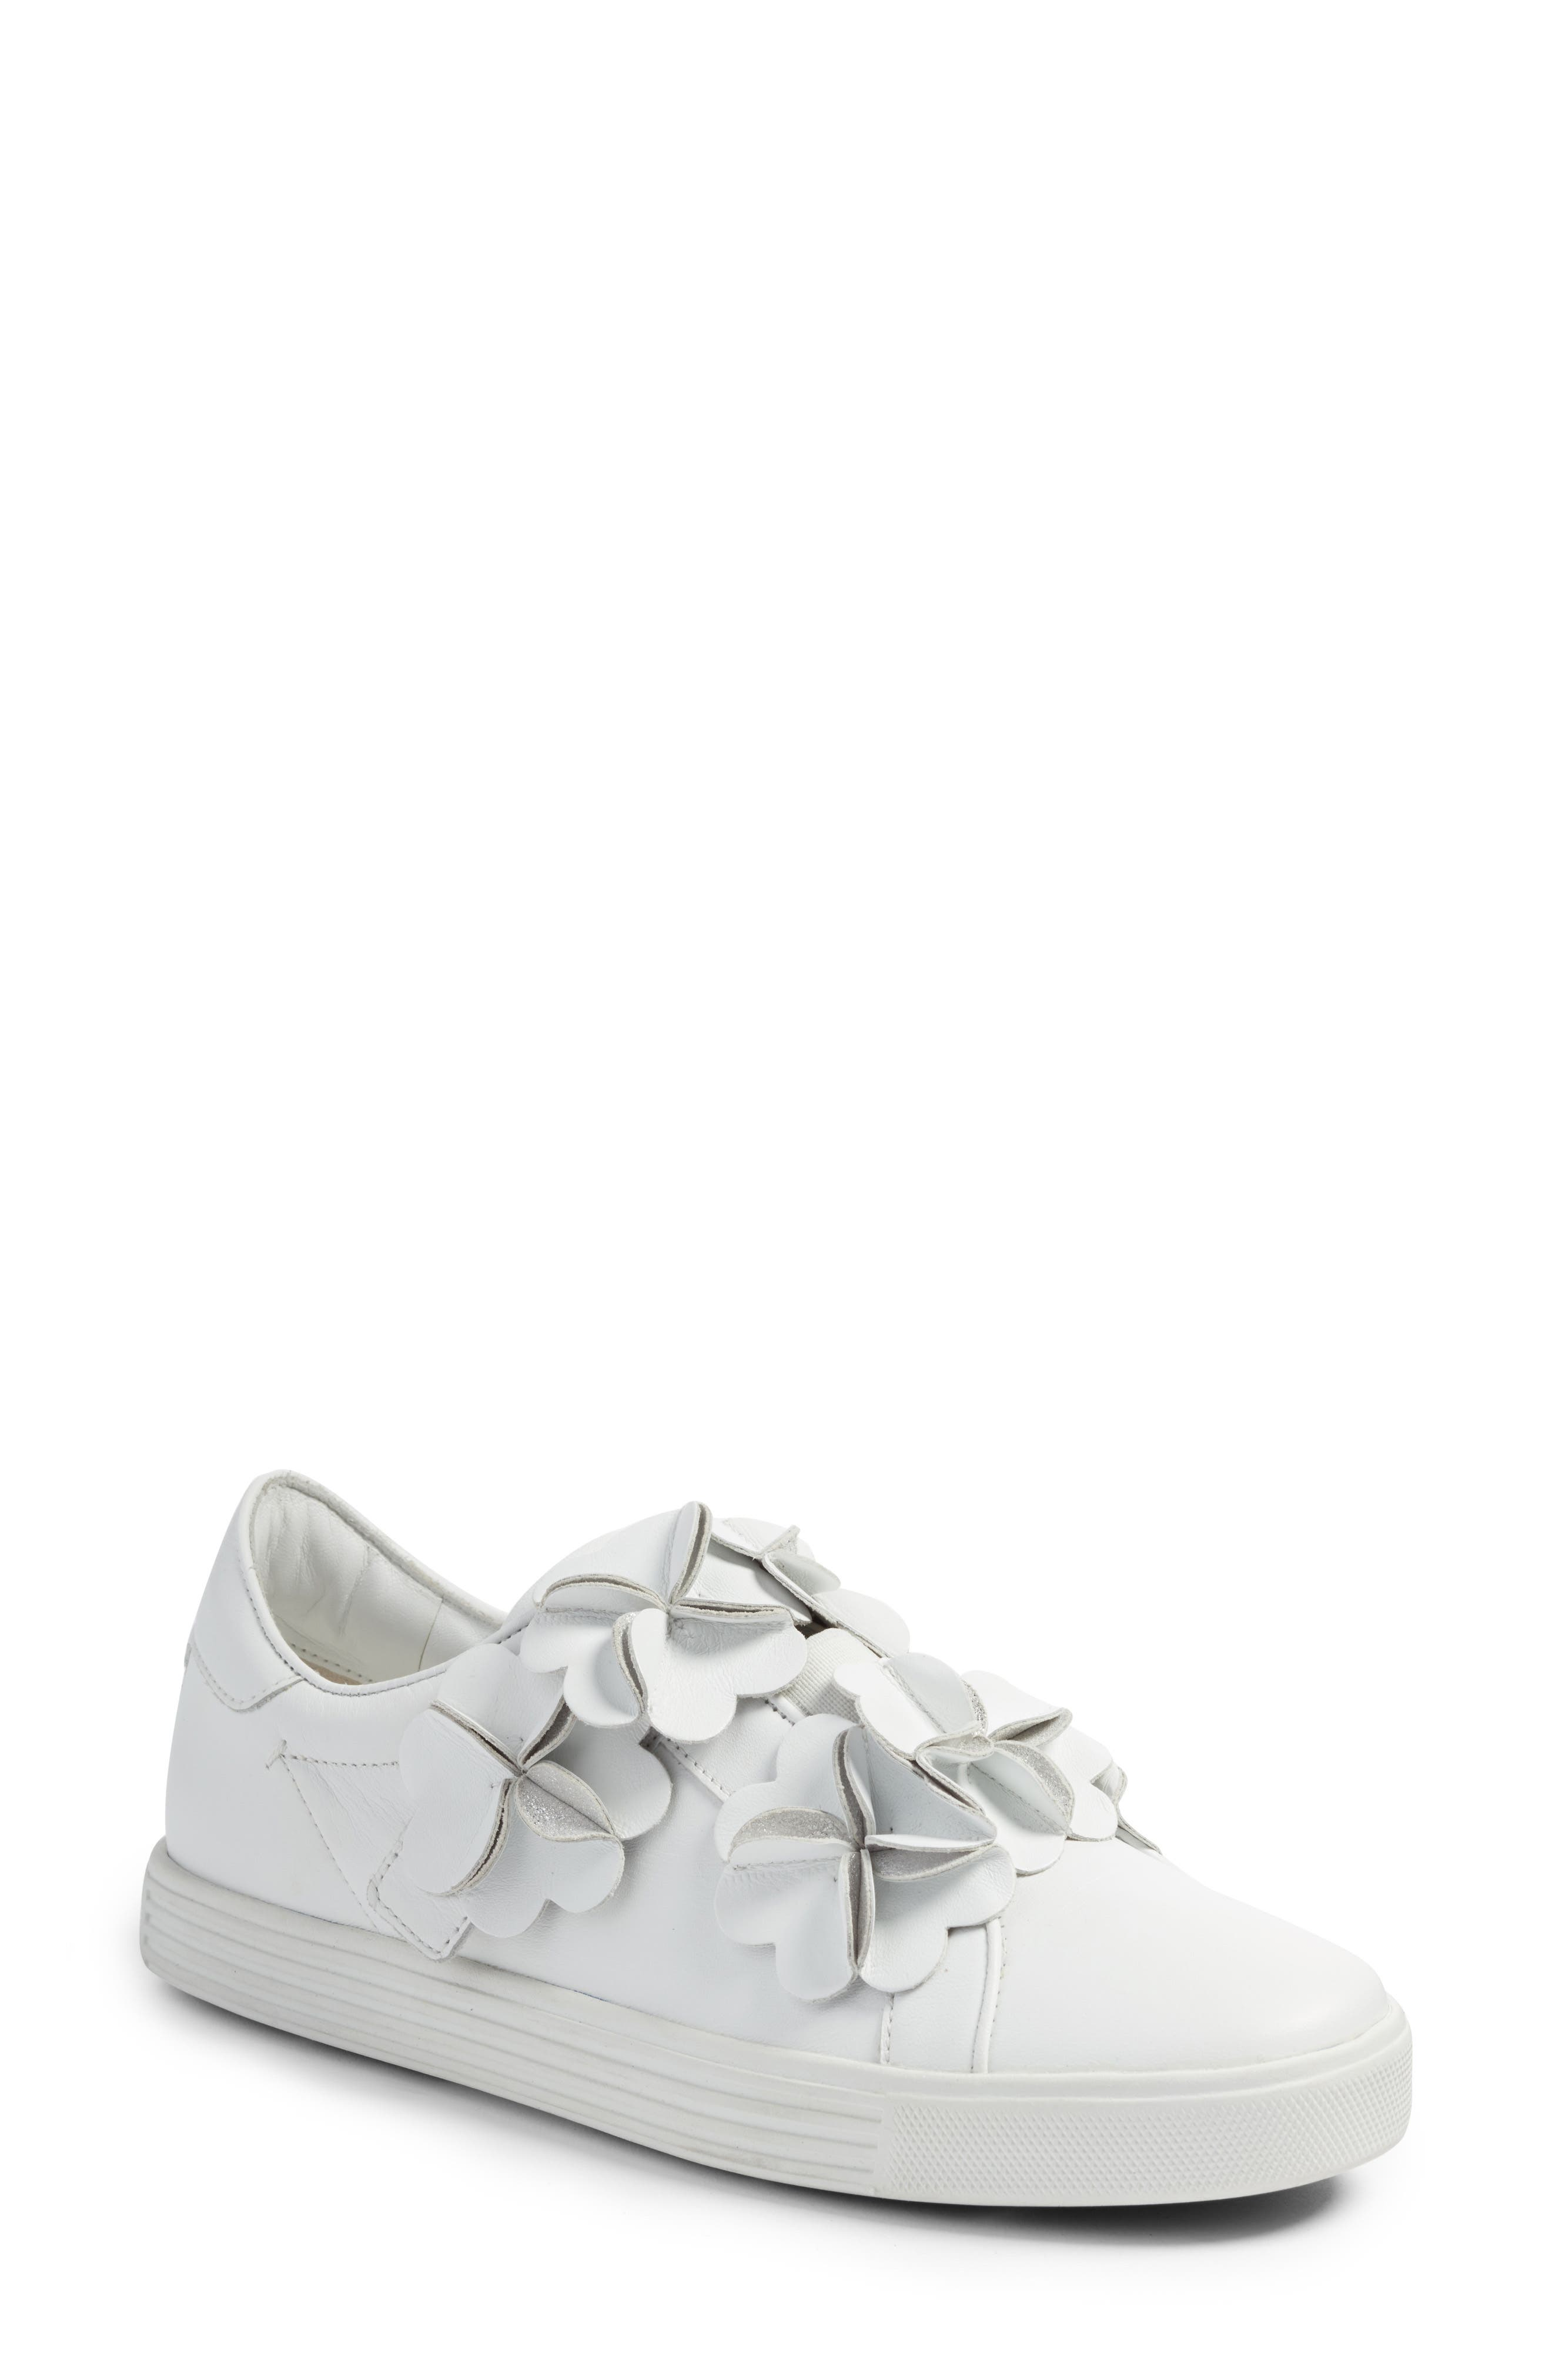 Kennel & Schmenger Town Floral Embellished Sneaker,                         Main,                         color, White/ Silver